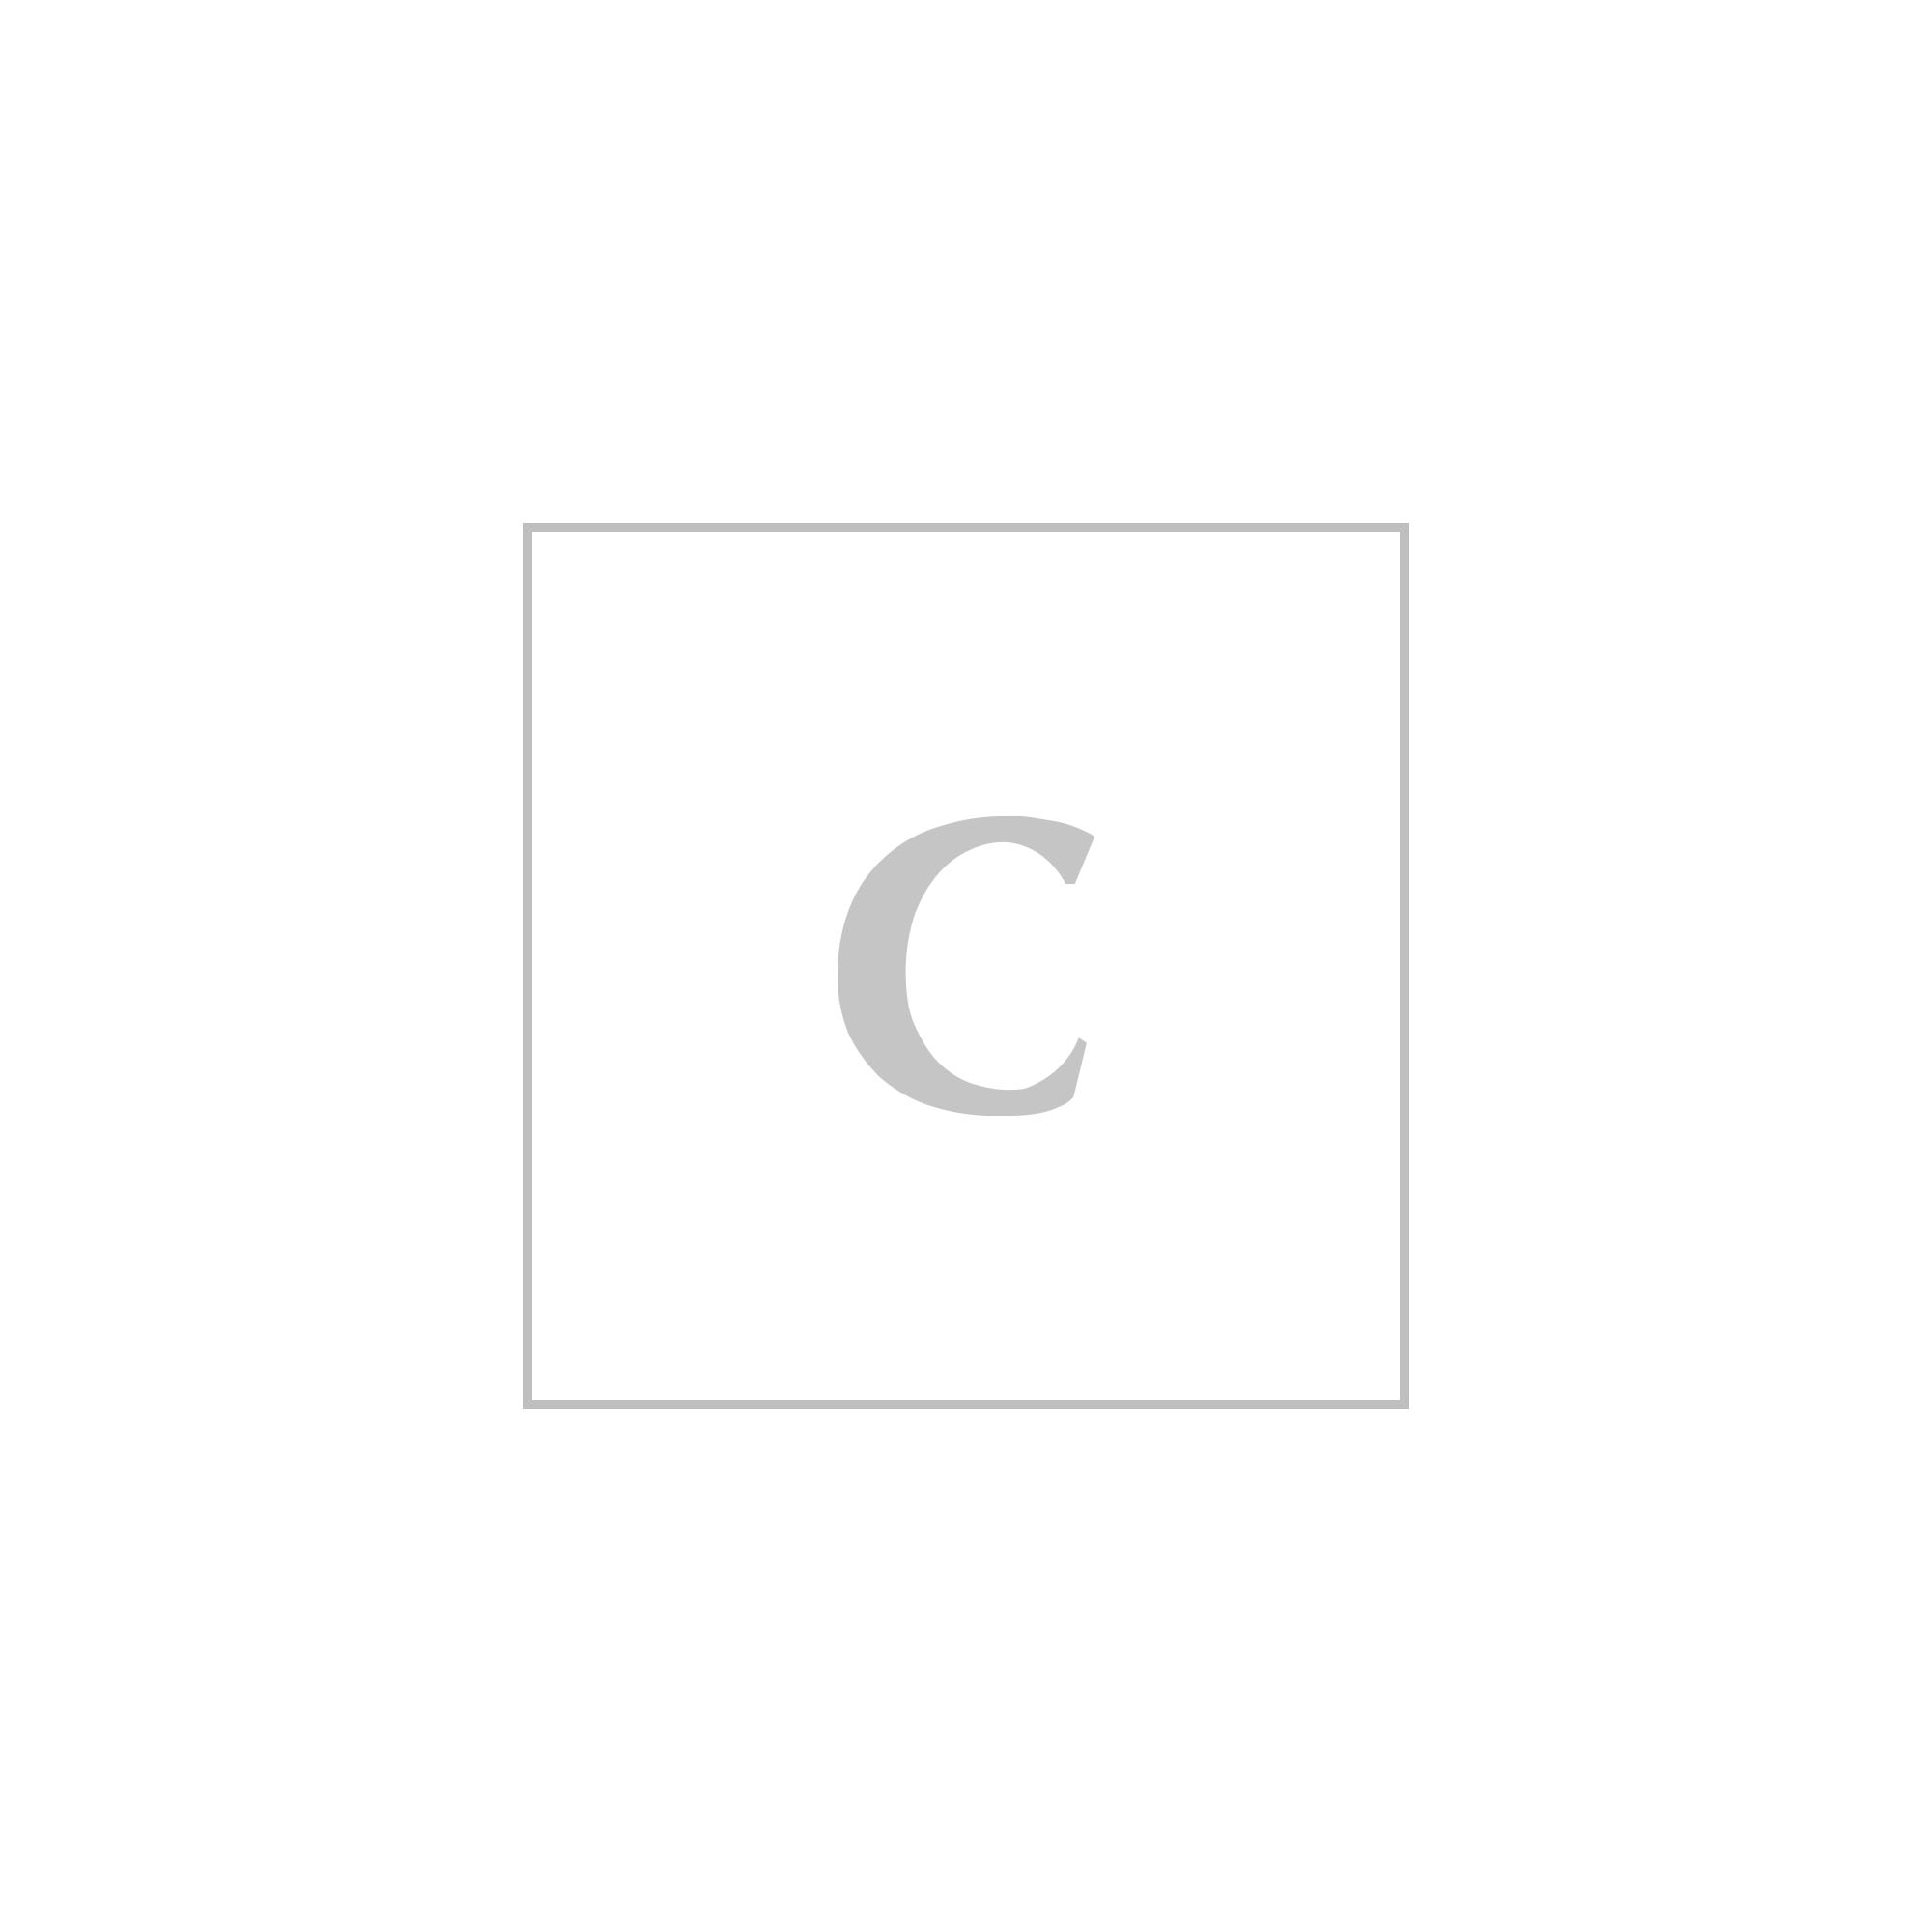 Salvatore ferragamo jacquard logo garda pumps